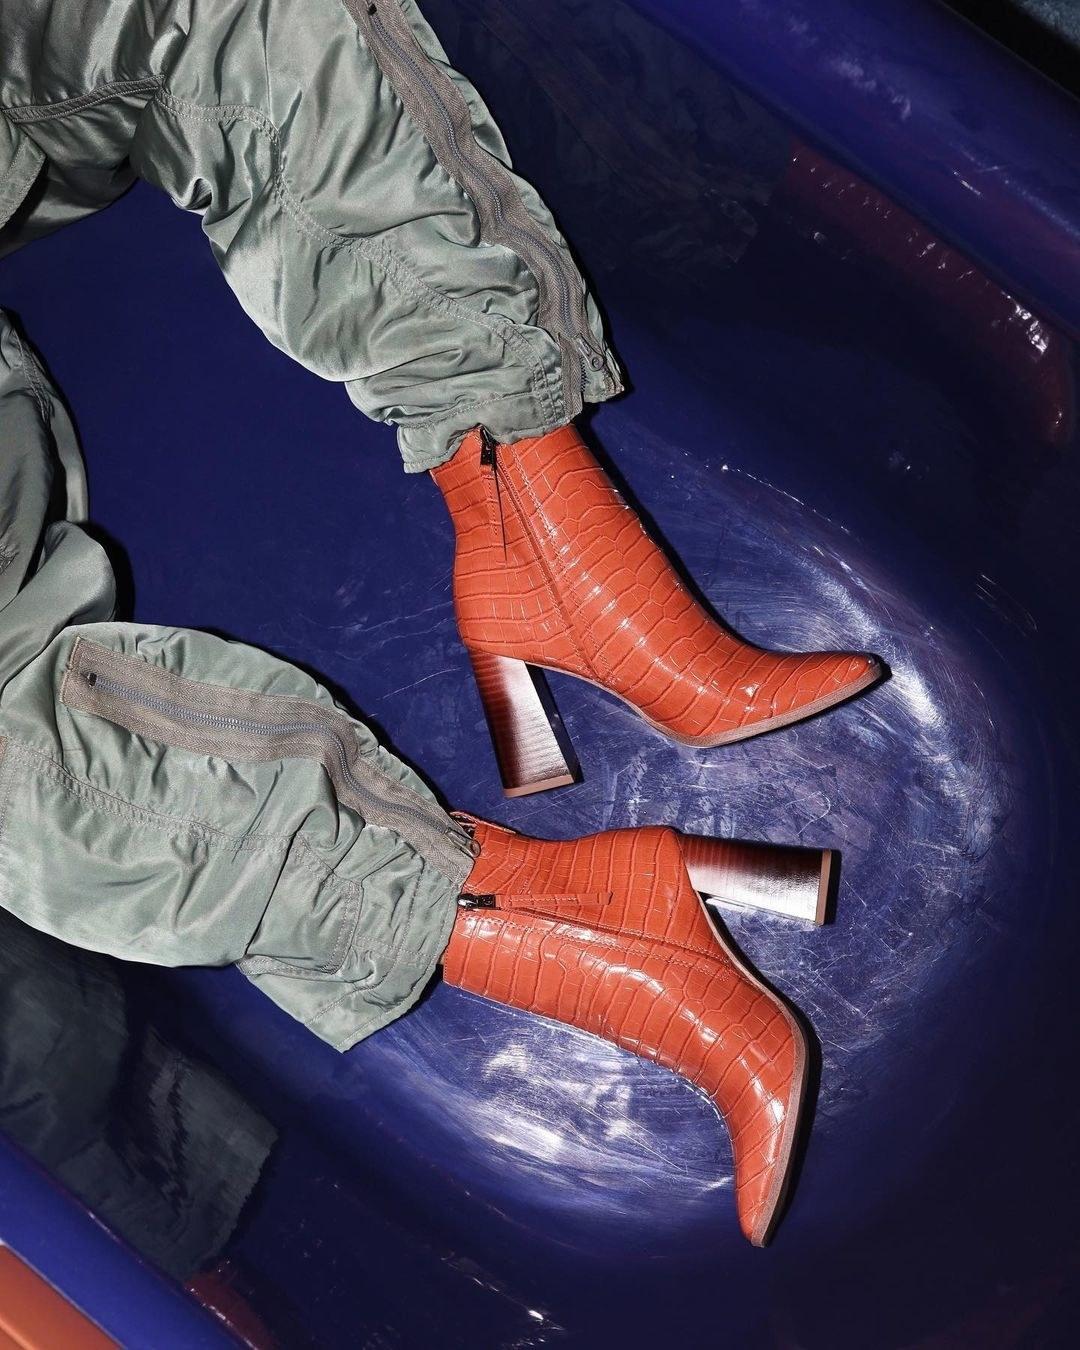 Model in the tan snakeskin booties with high wooden heels